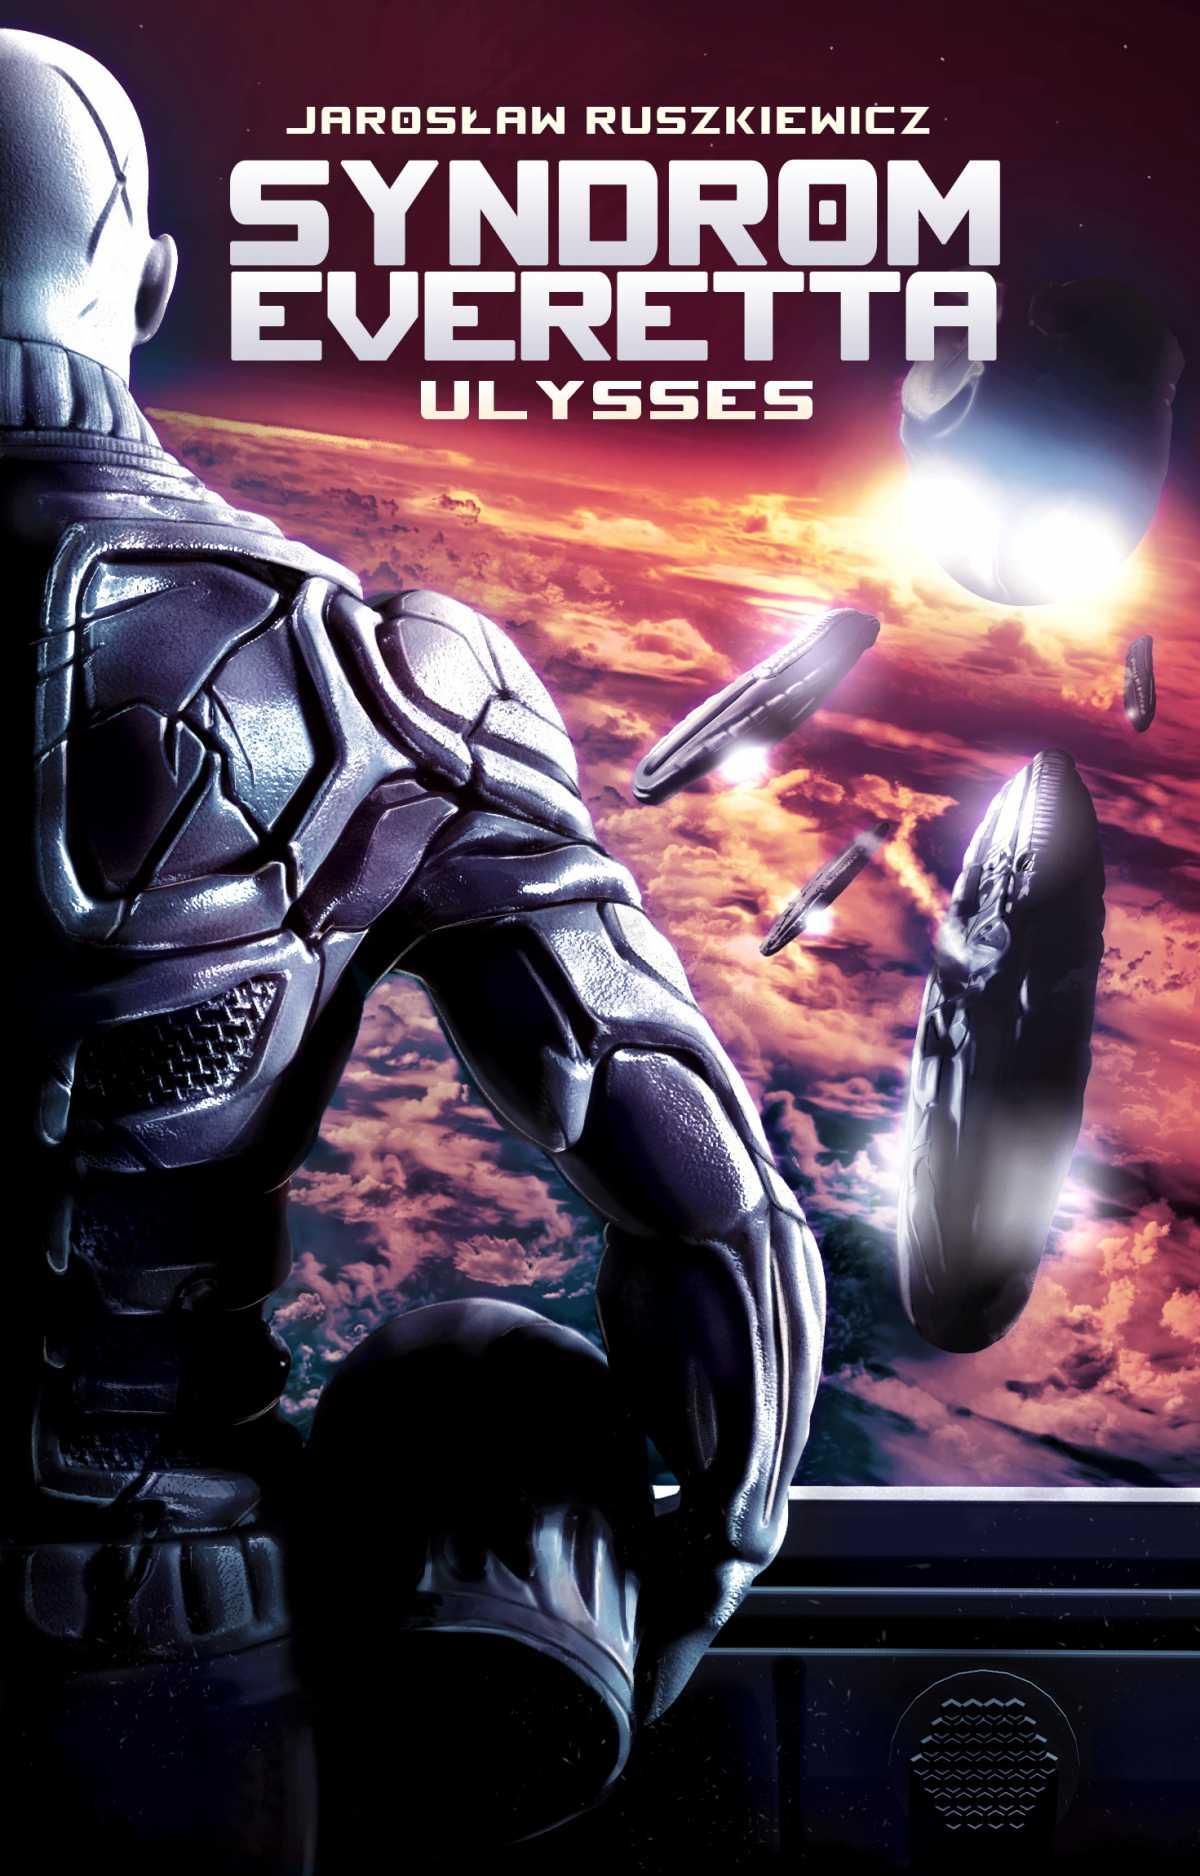 Syndrom Everetta: Ulysses - Ebook (Książka EPUB) do pobrania w formacie EPUB